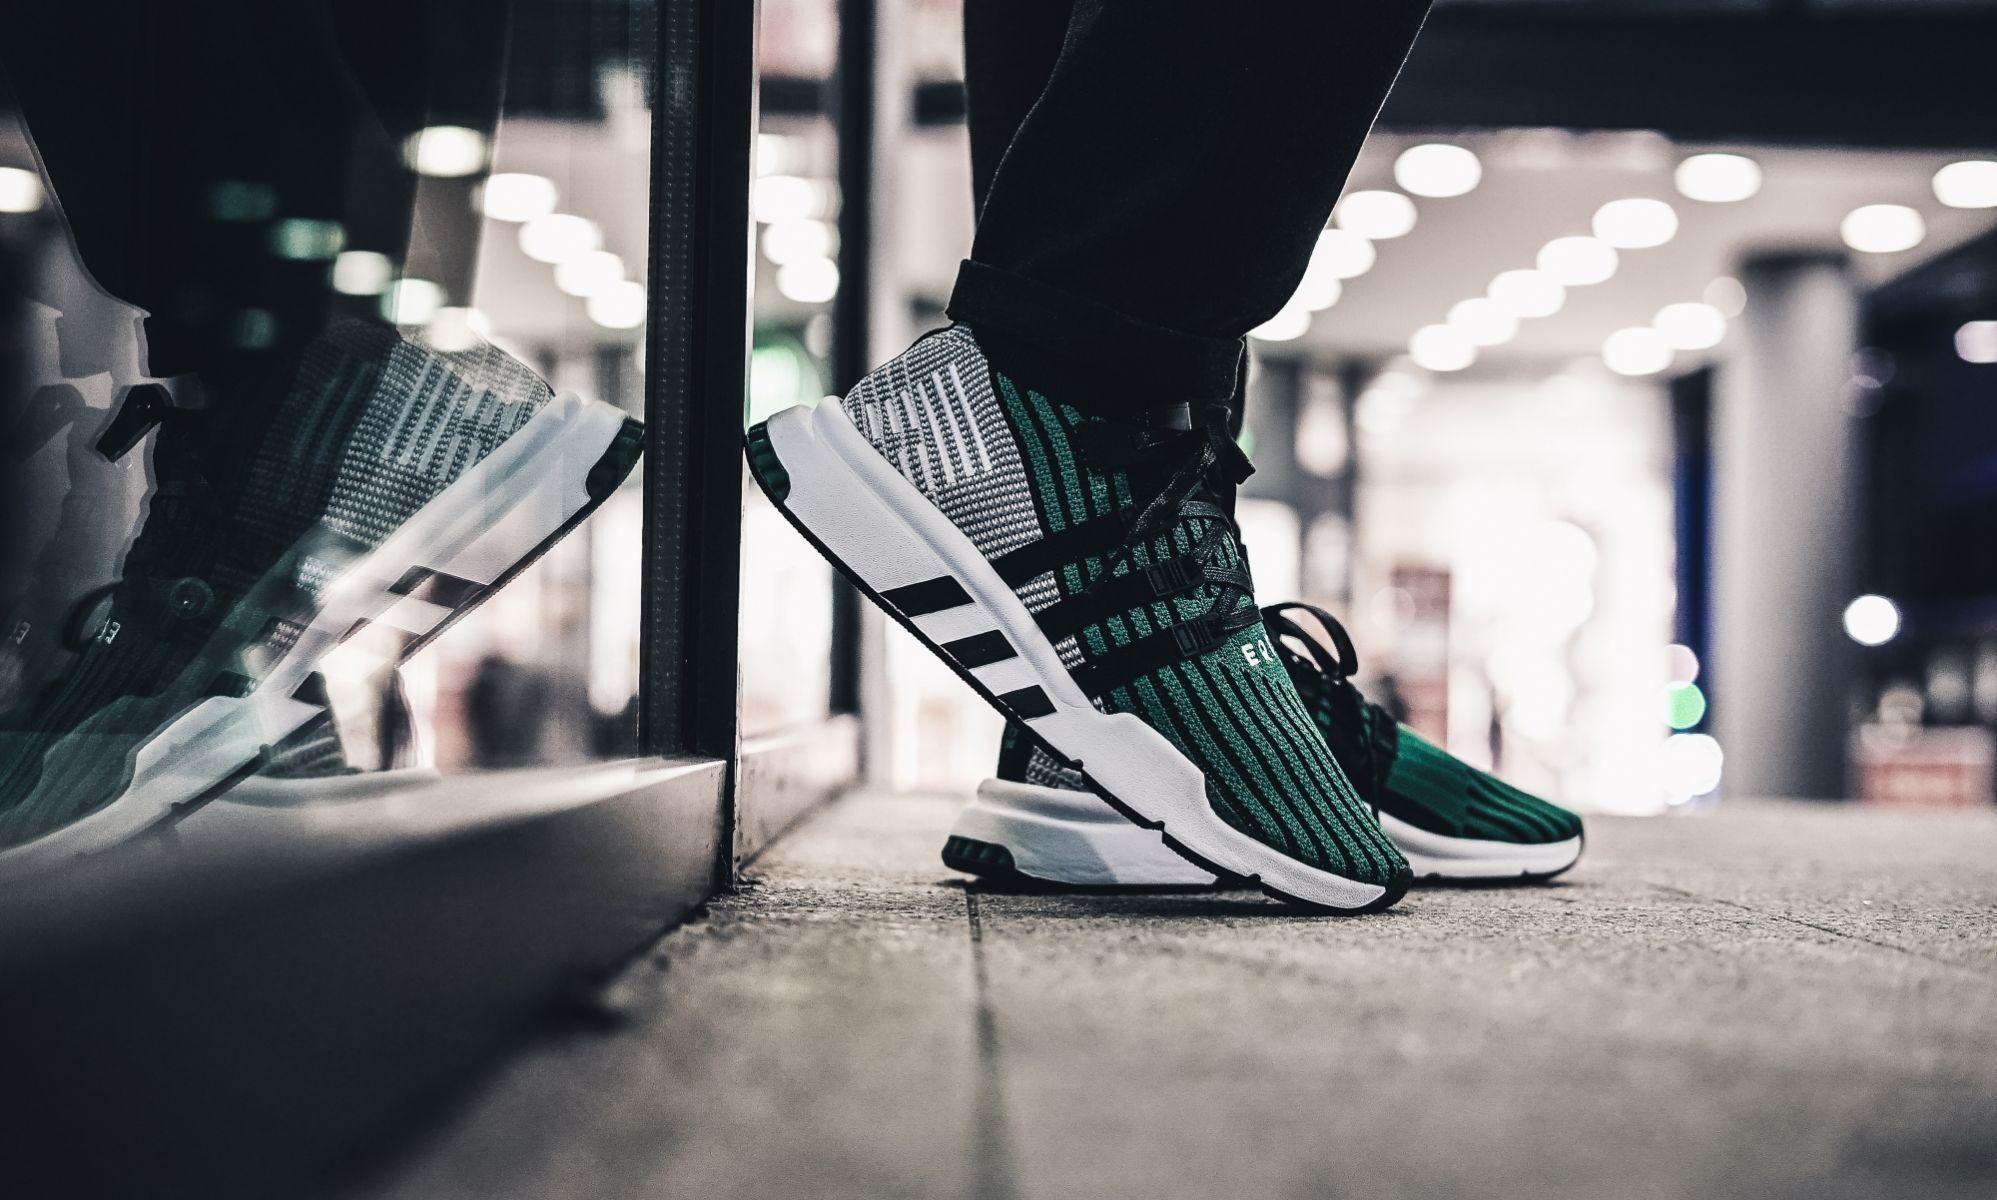 brand new c7e4c 100c9 adidas EQT Support Mid ADV (schwarz  grün) - CQ2998  43einhalb sneaker  store